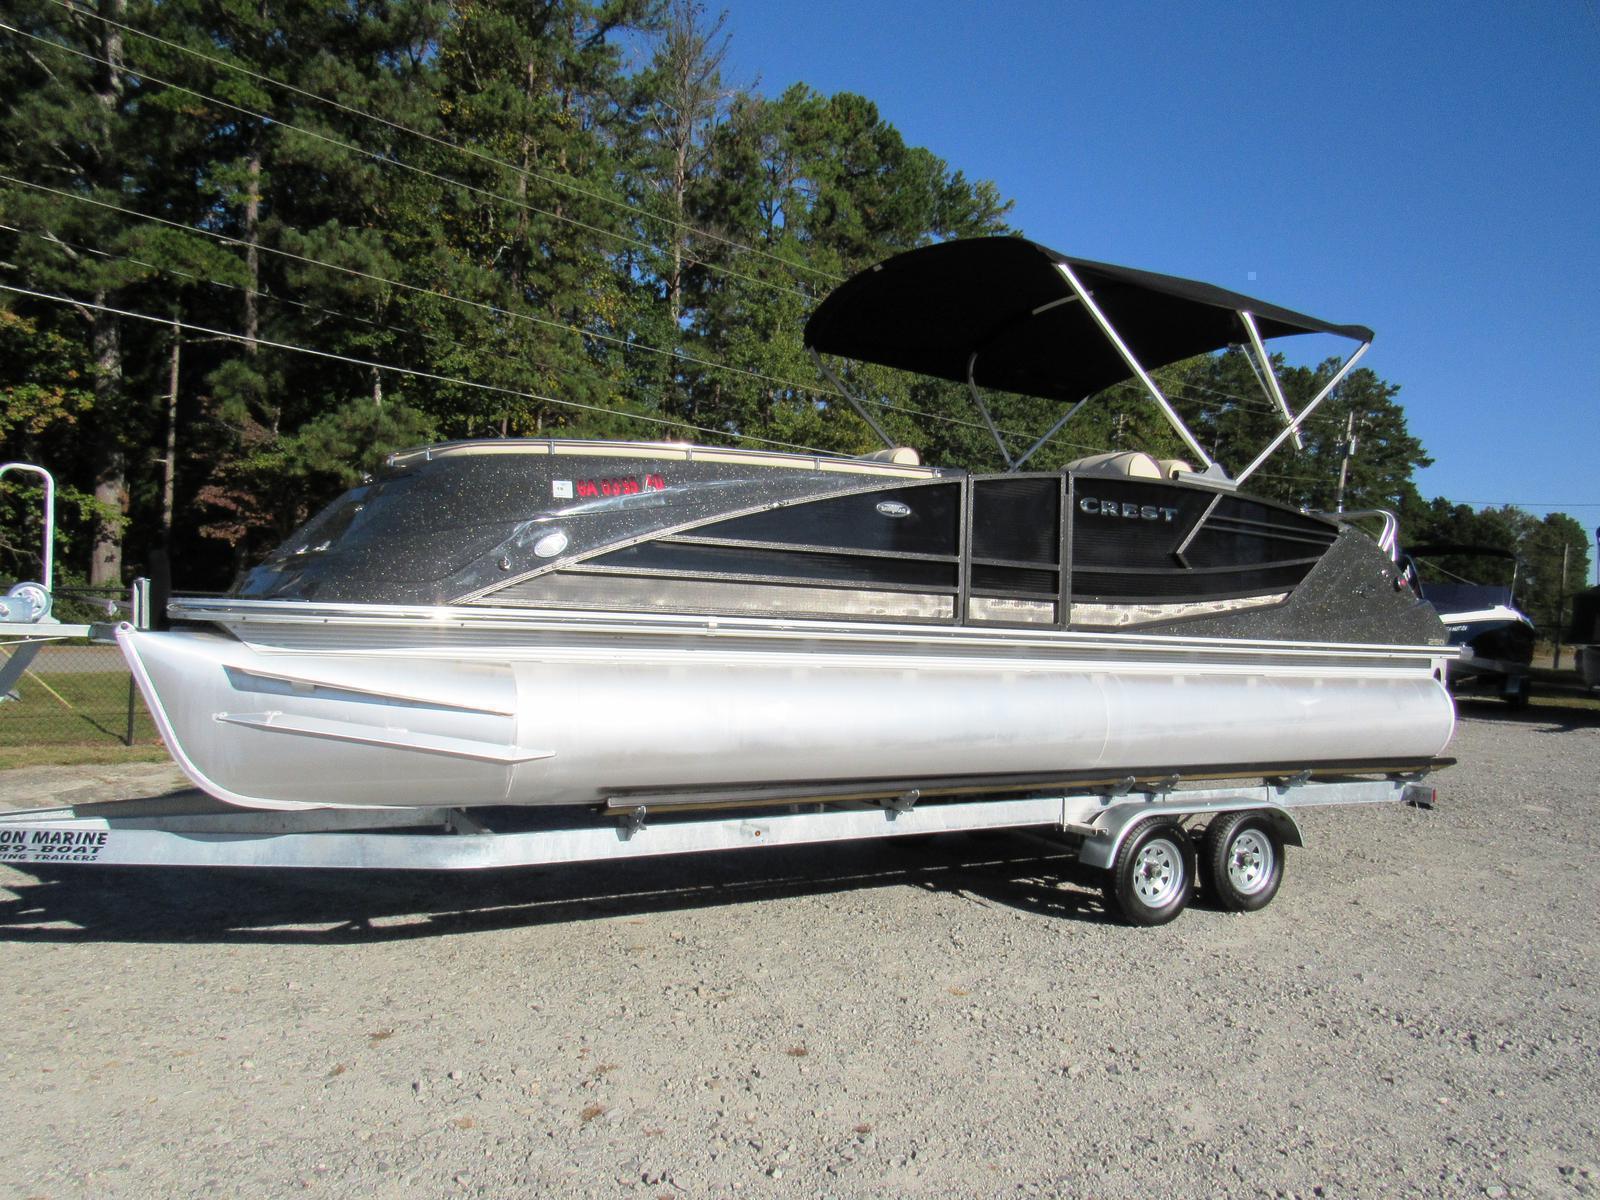 Crest Pontoon Boats SAV 250 NX